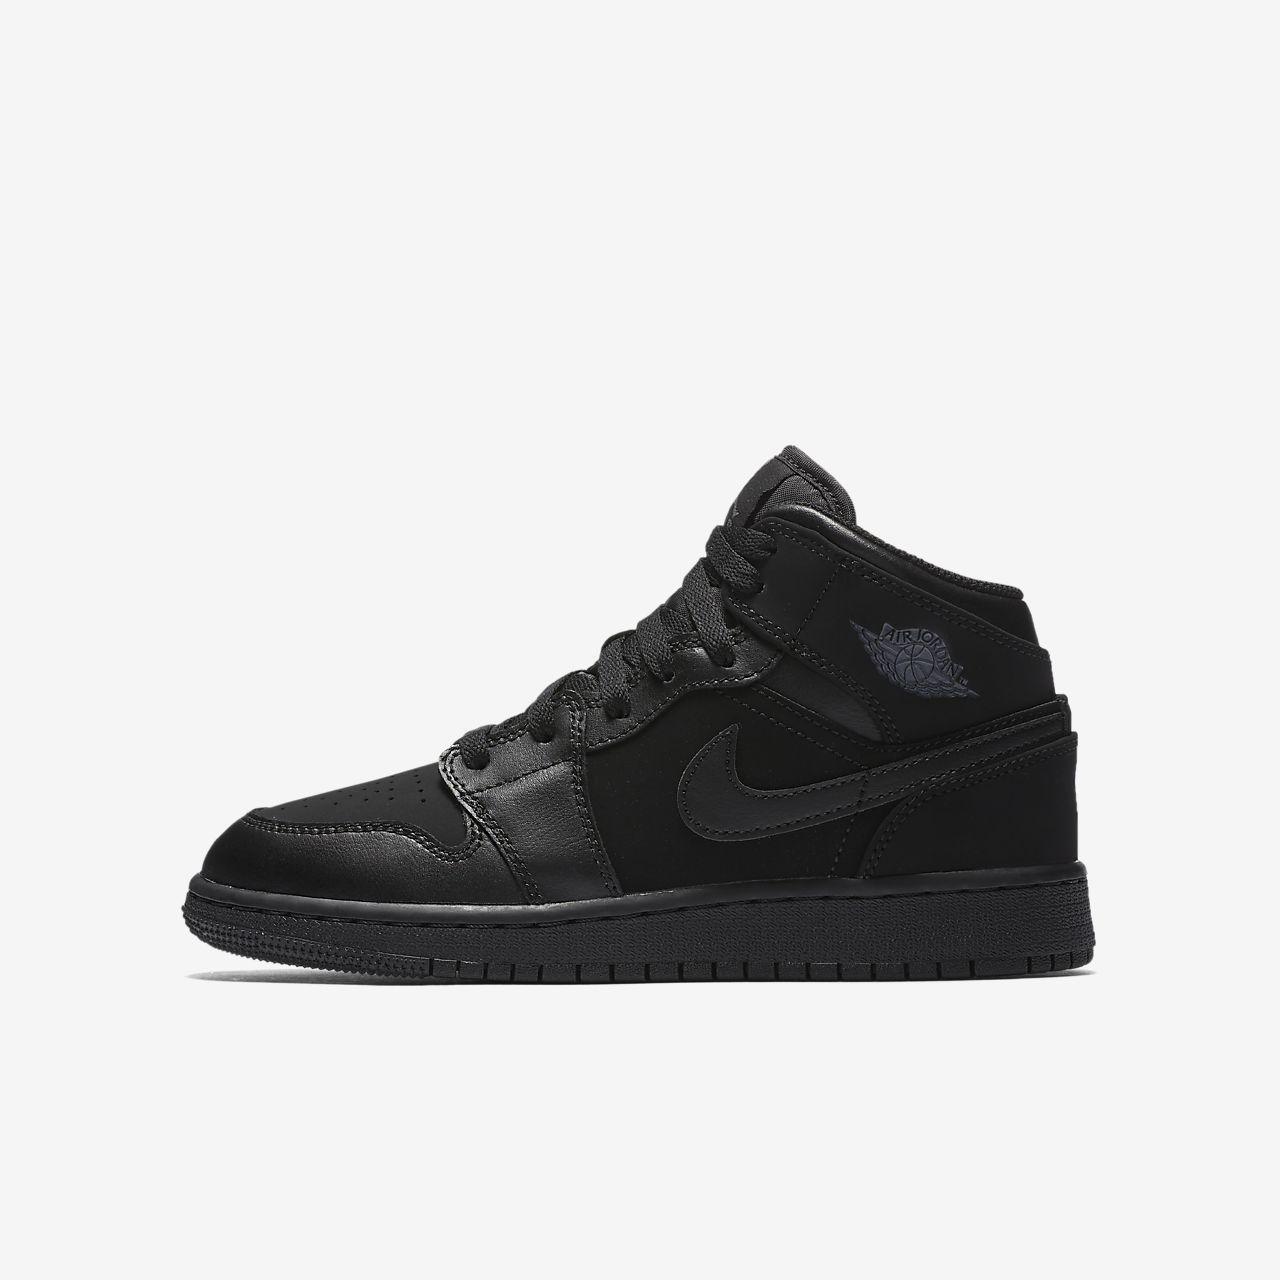 7814ef223 Air Jordan 1 Mid Older Kids  Shoe. Nike.com GB